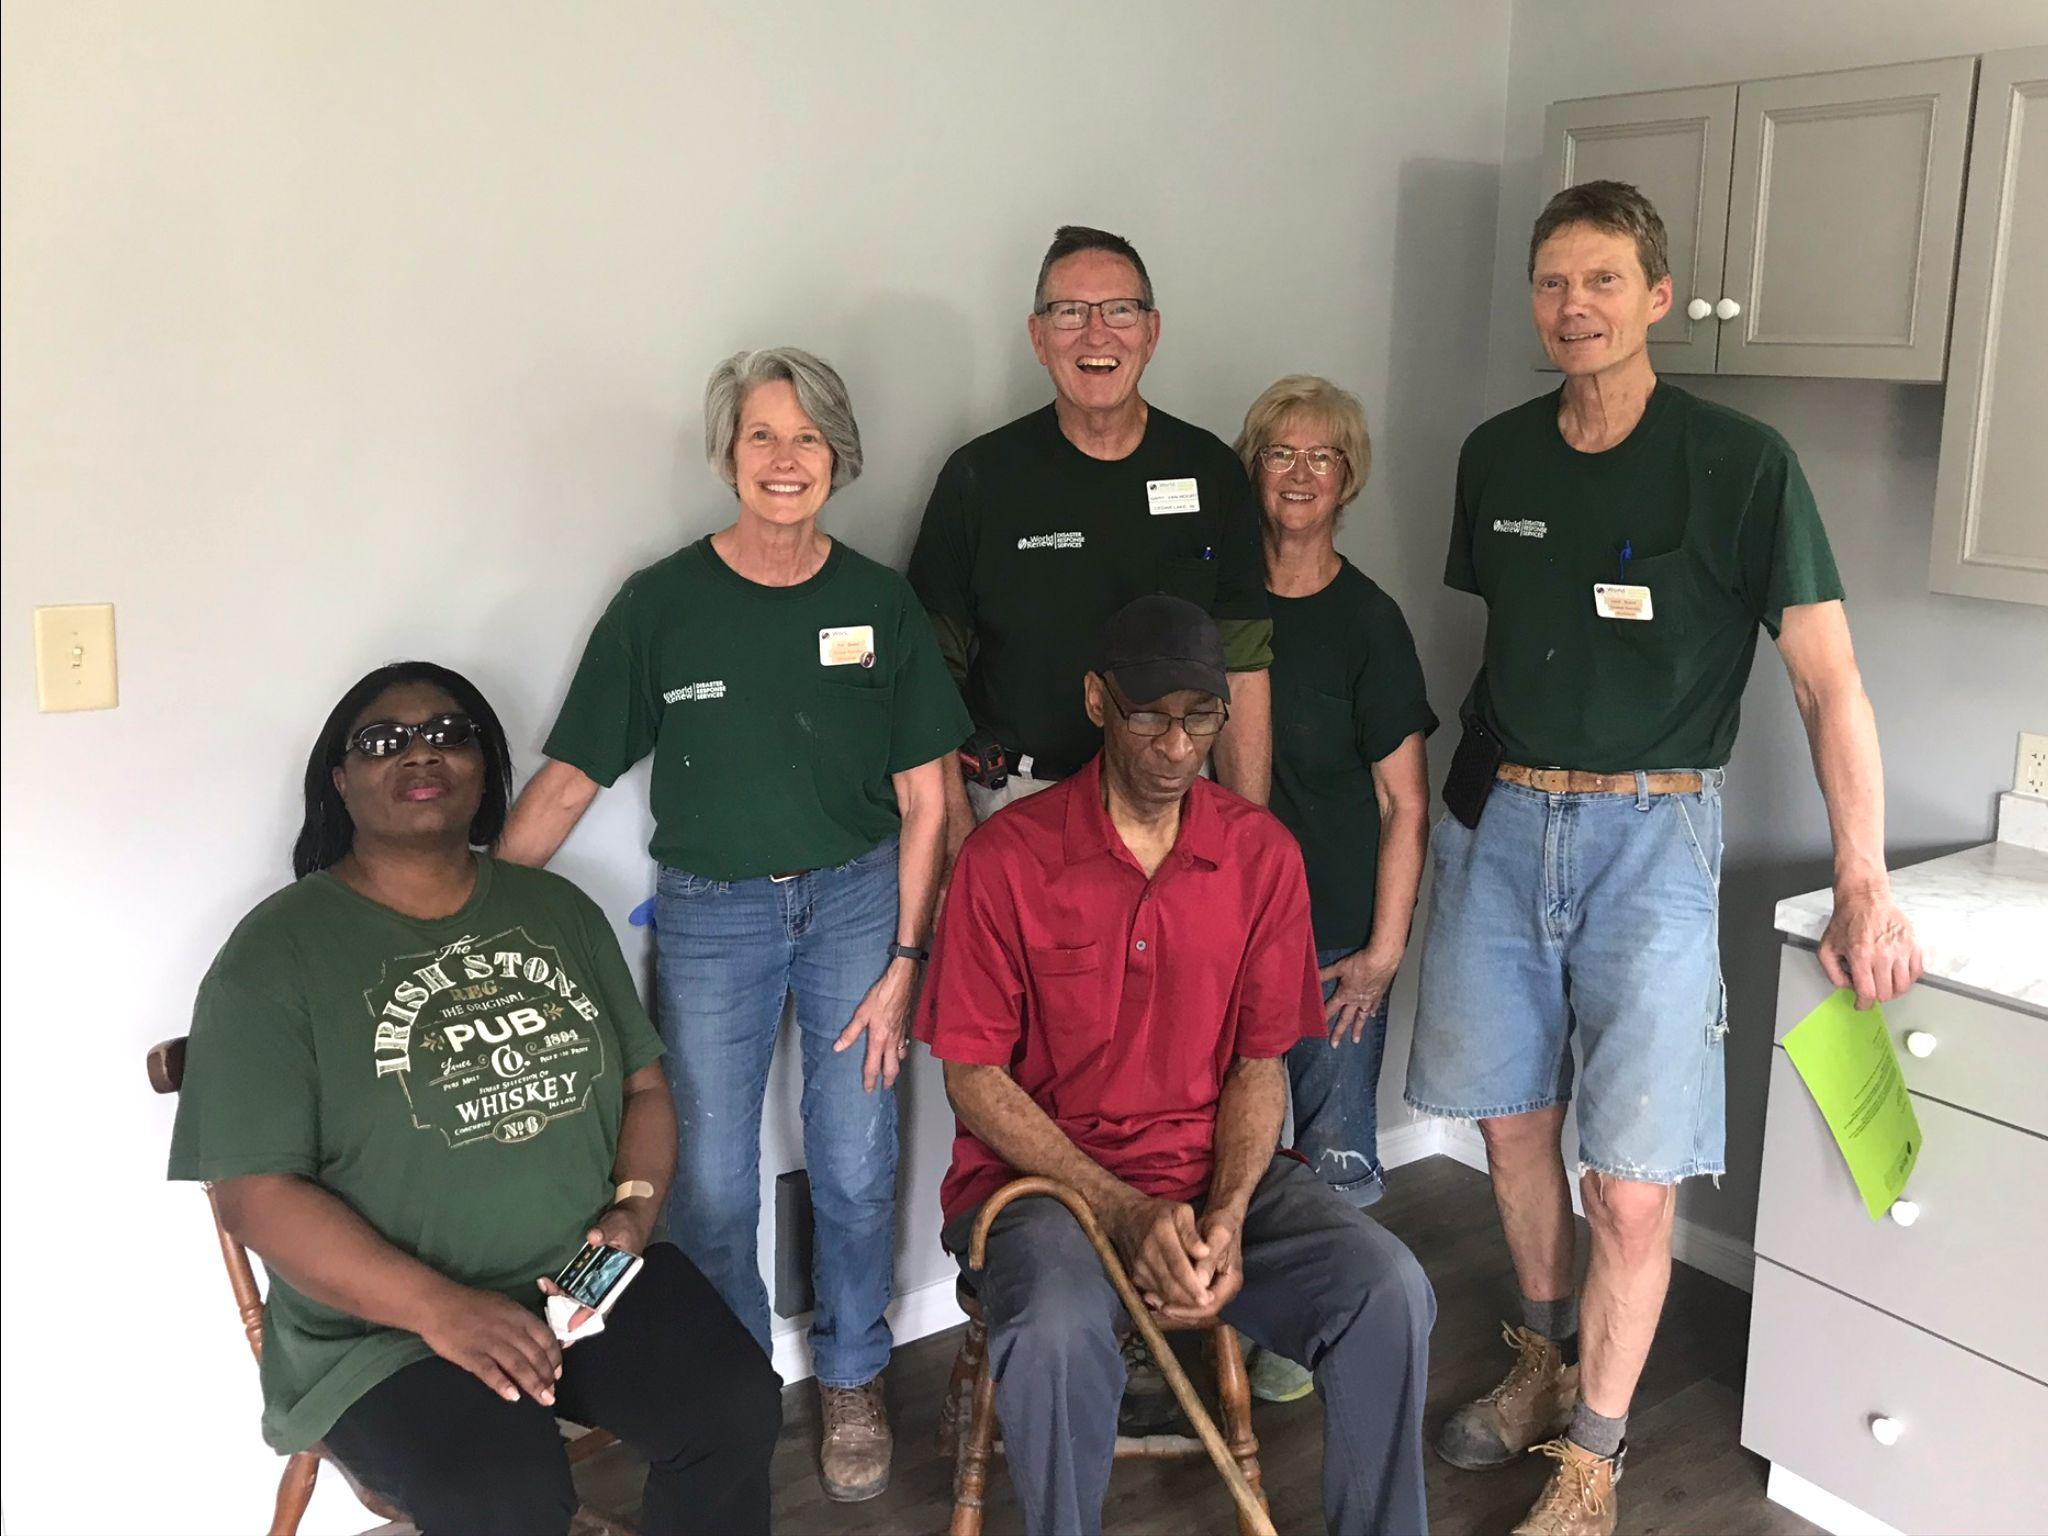 World Renew Volunteers at a house dedication